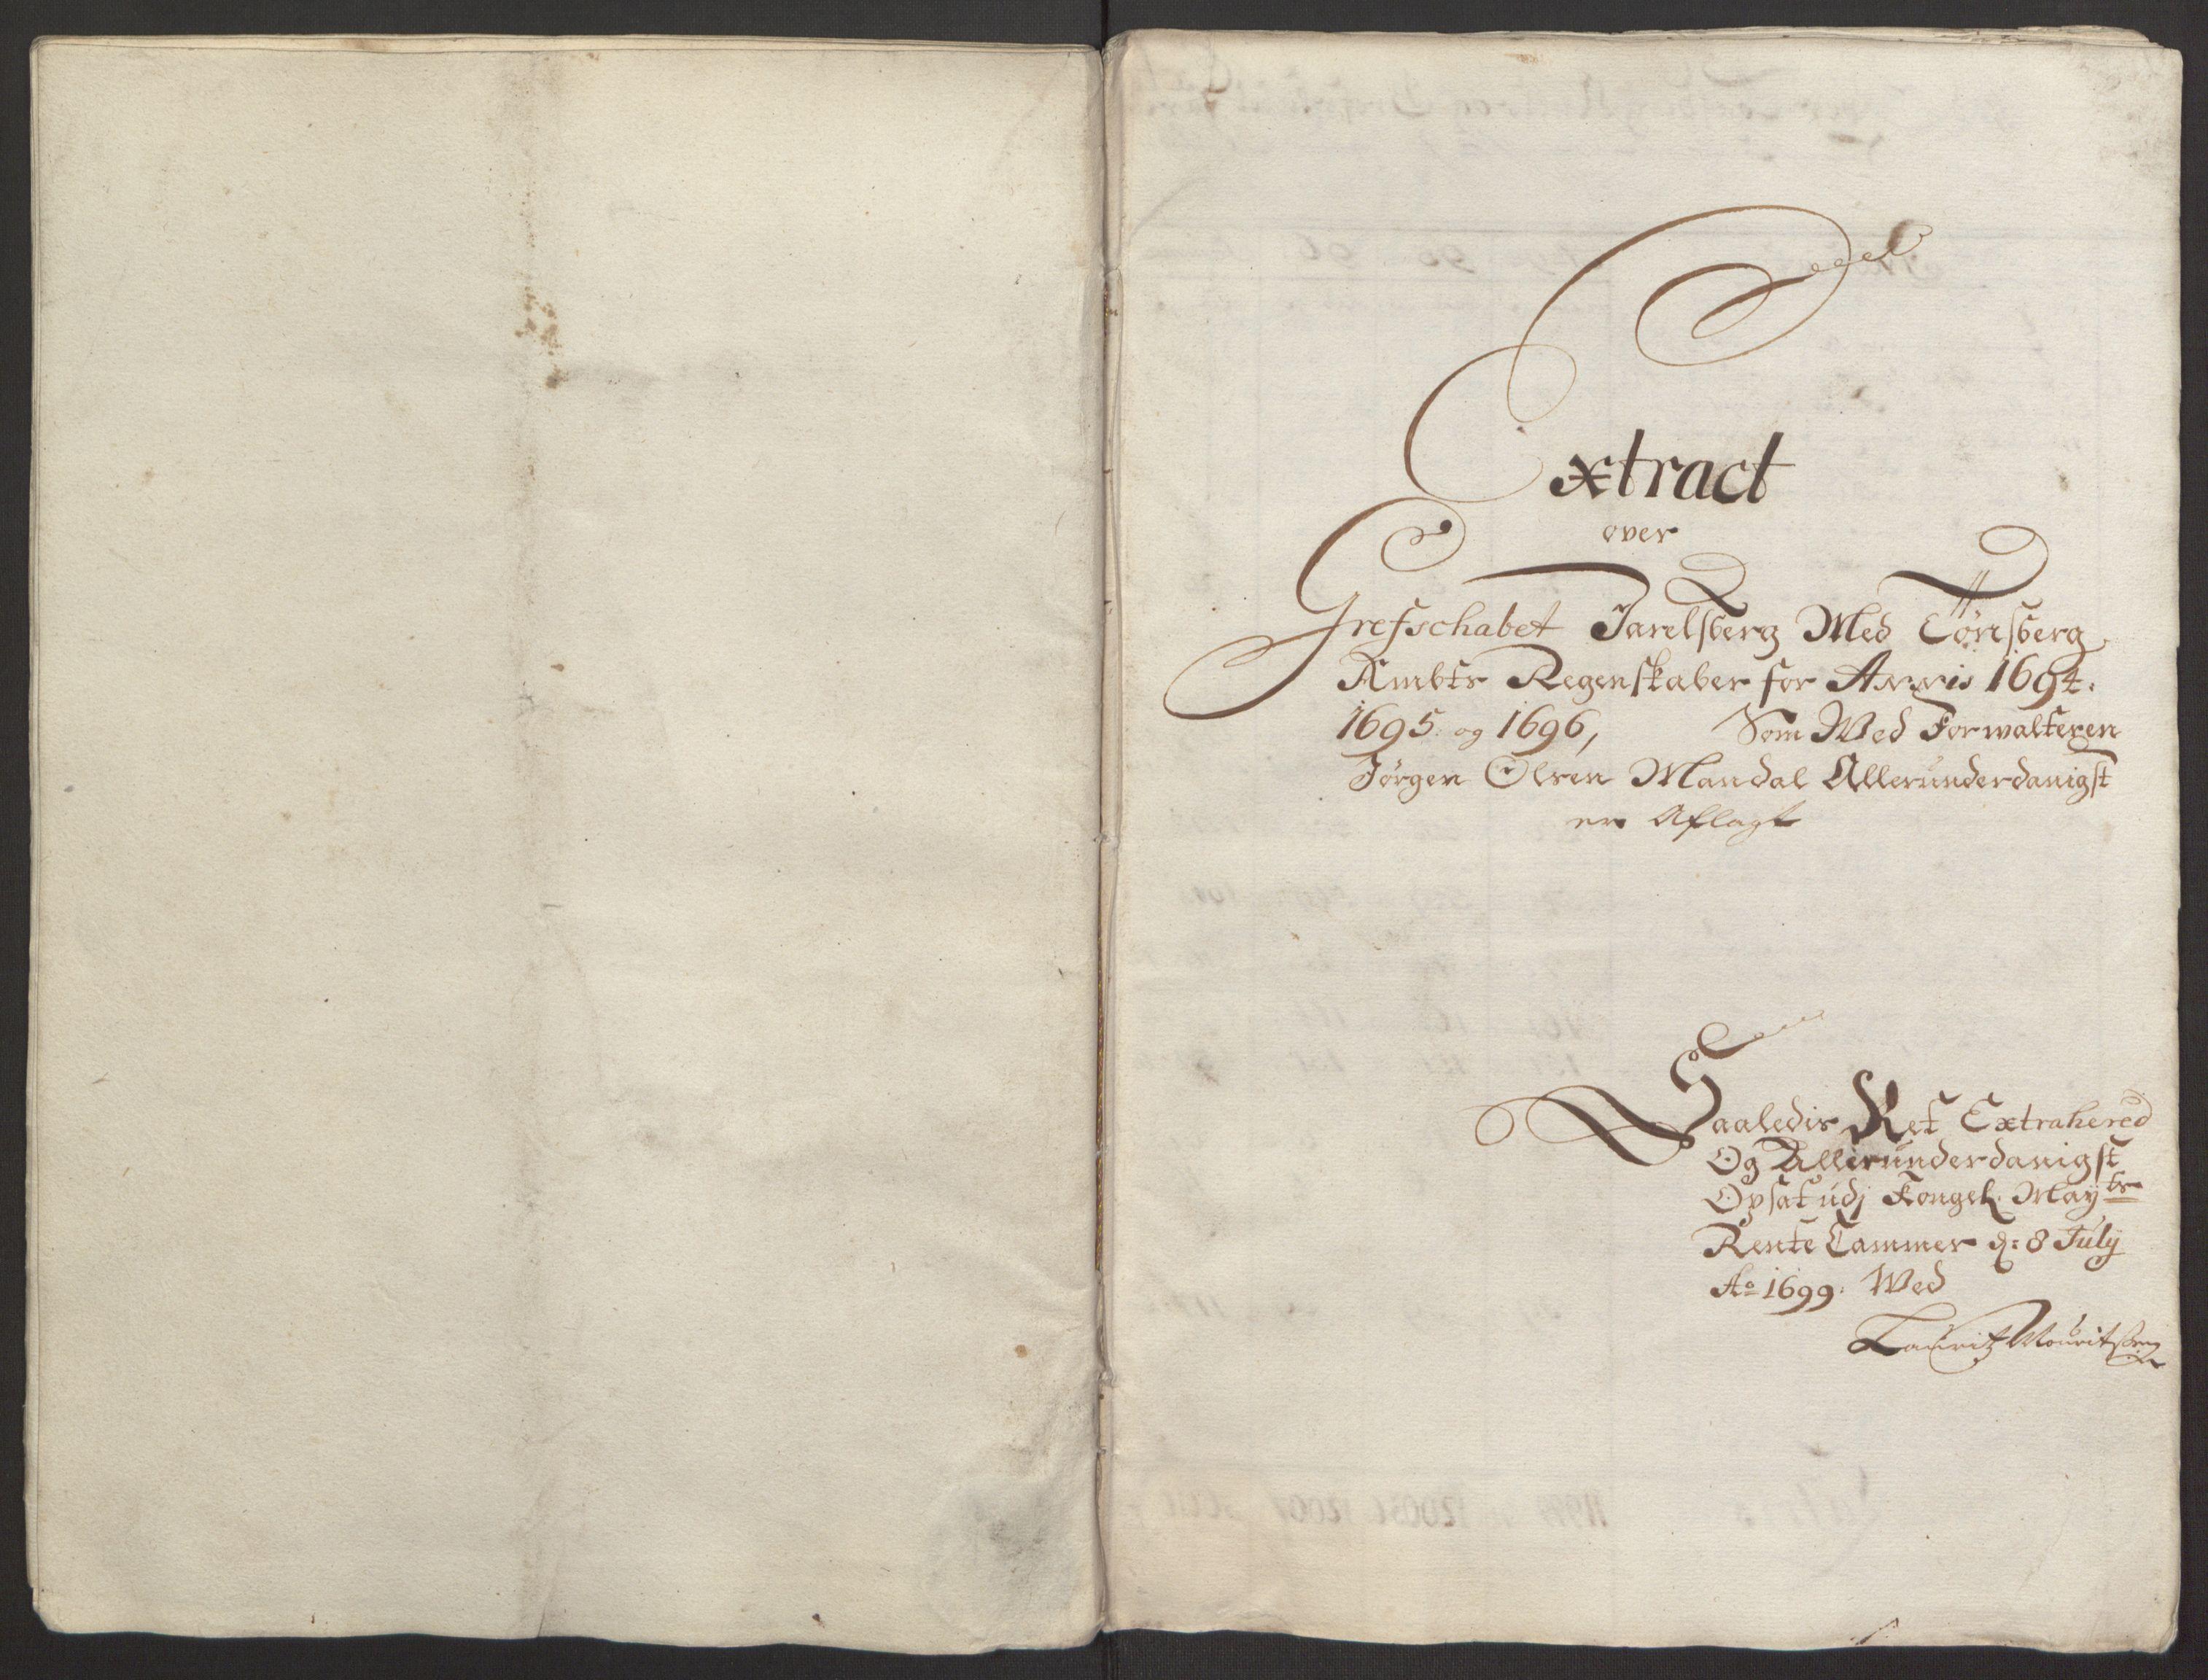 RA, Rentekammeret inntil 1814, Reviderte regnskaper, Fogderegnskap, R32/L1867: Fogderegnskap Jarlsberg grevskap, 1694-1696, s. 443